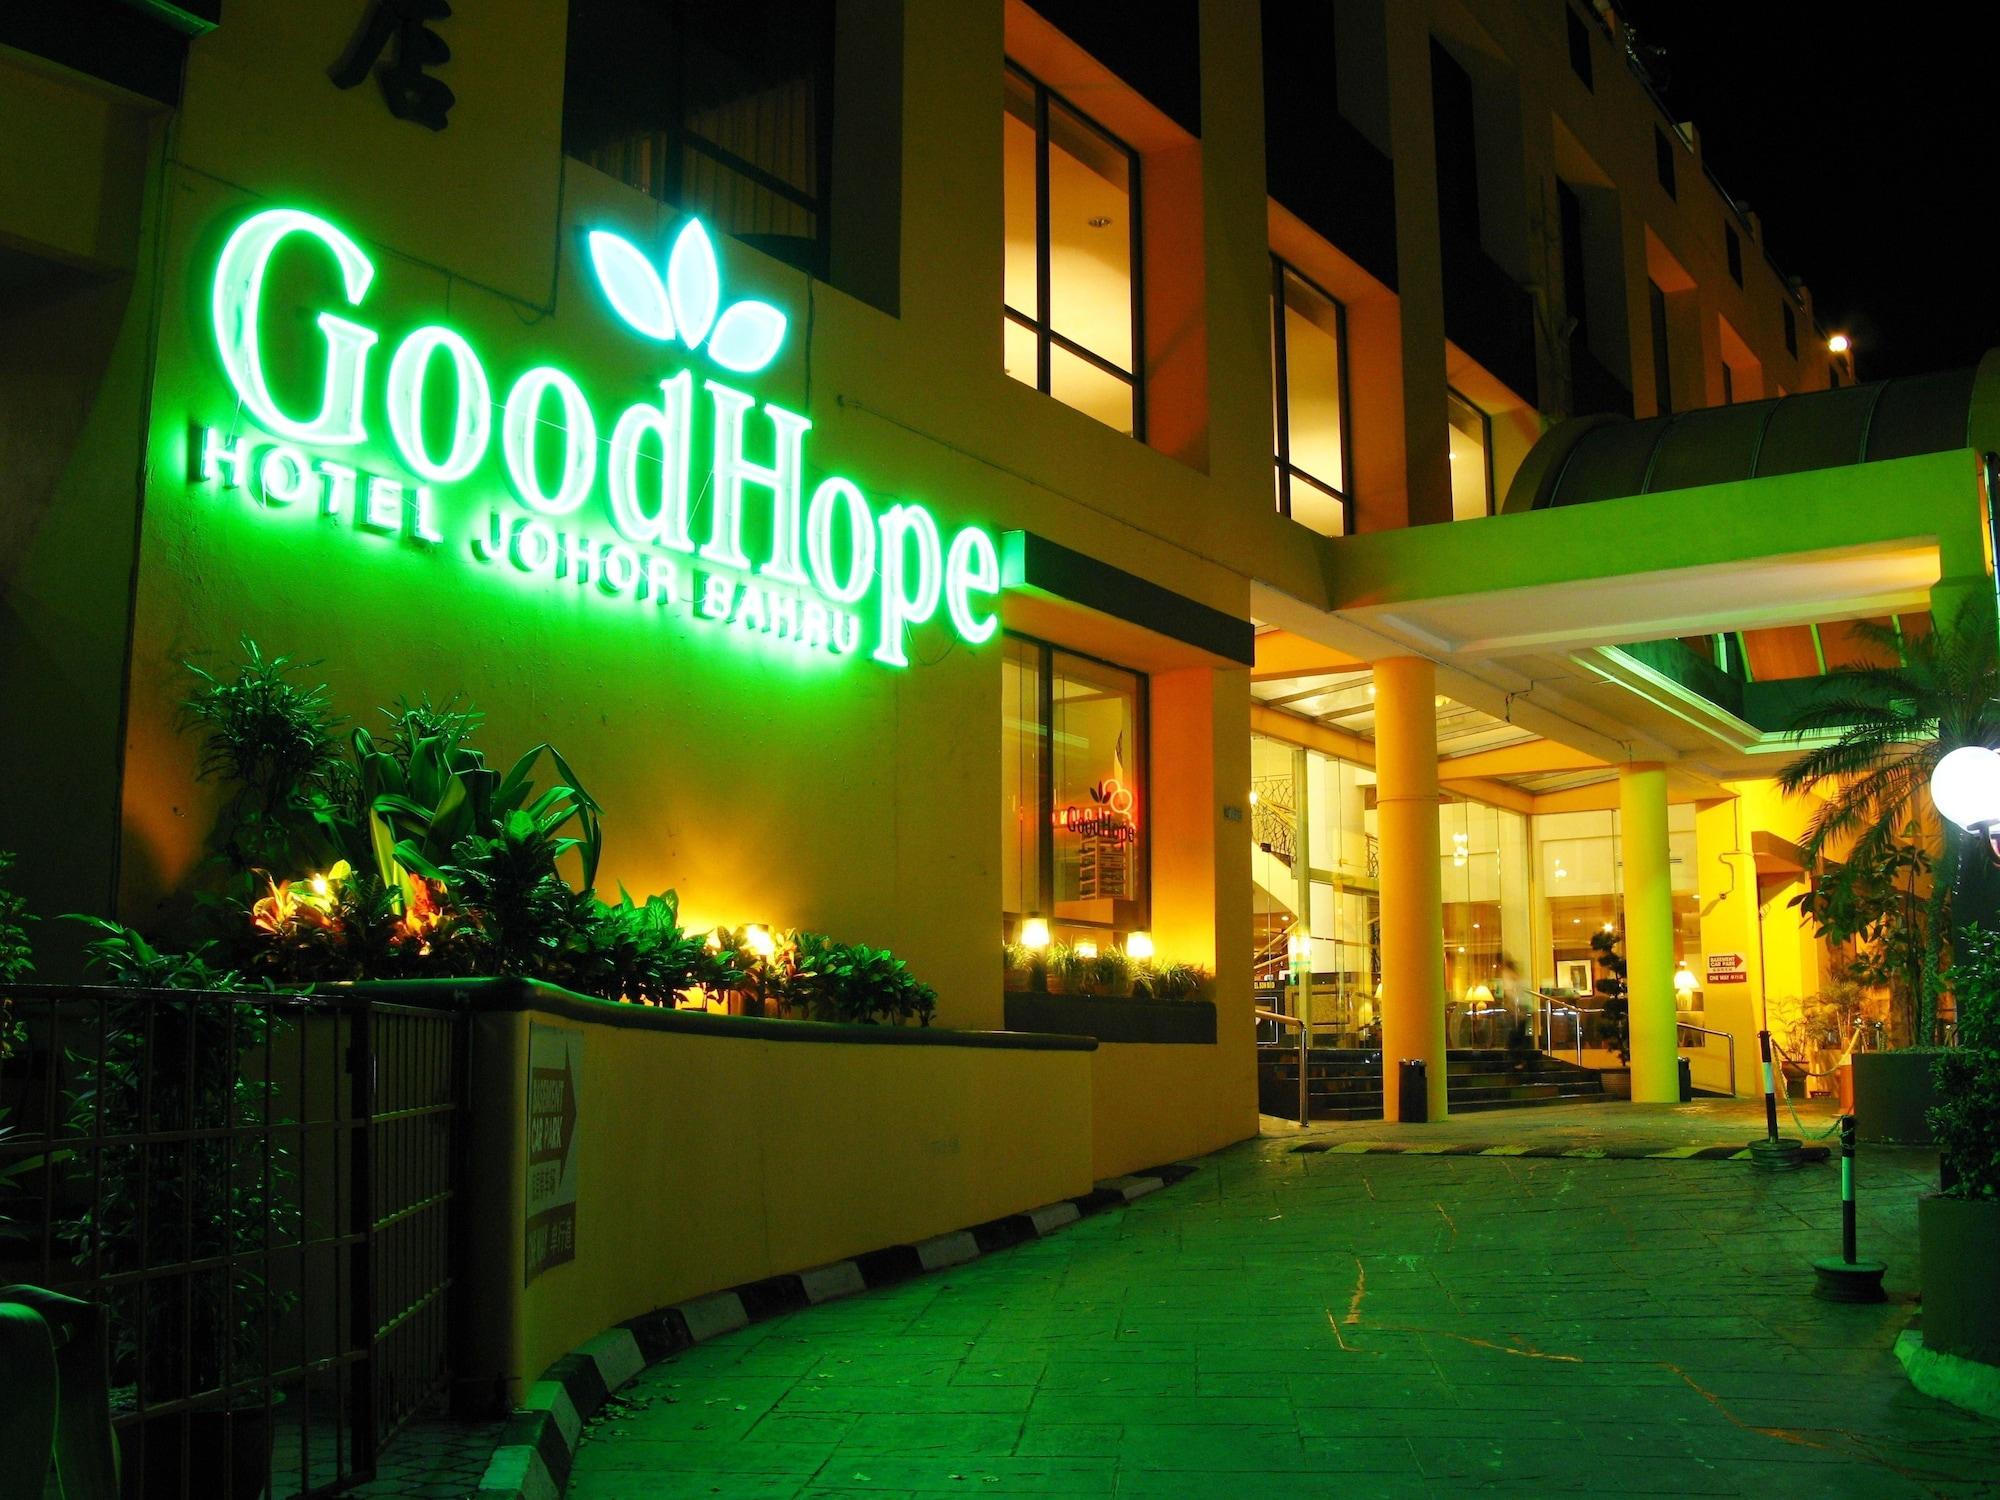 GoodHope Hotel Skudai Johor Bahru, Johor Bahru